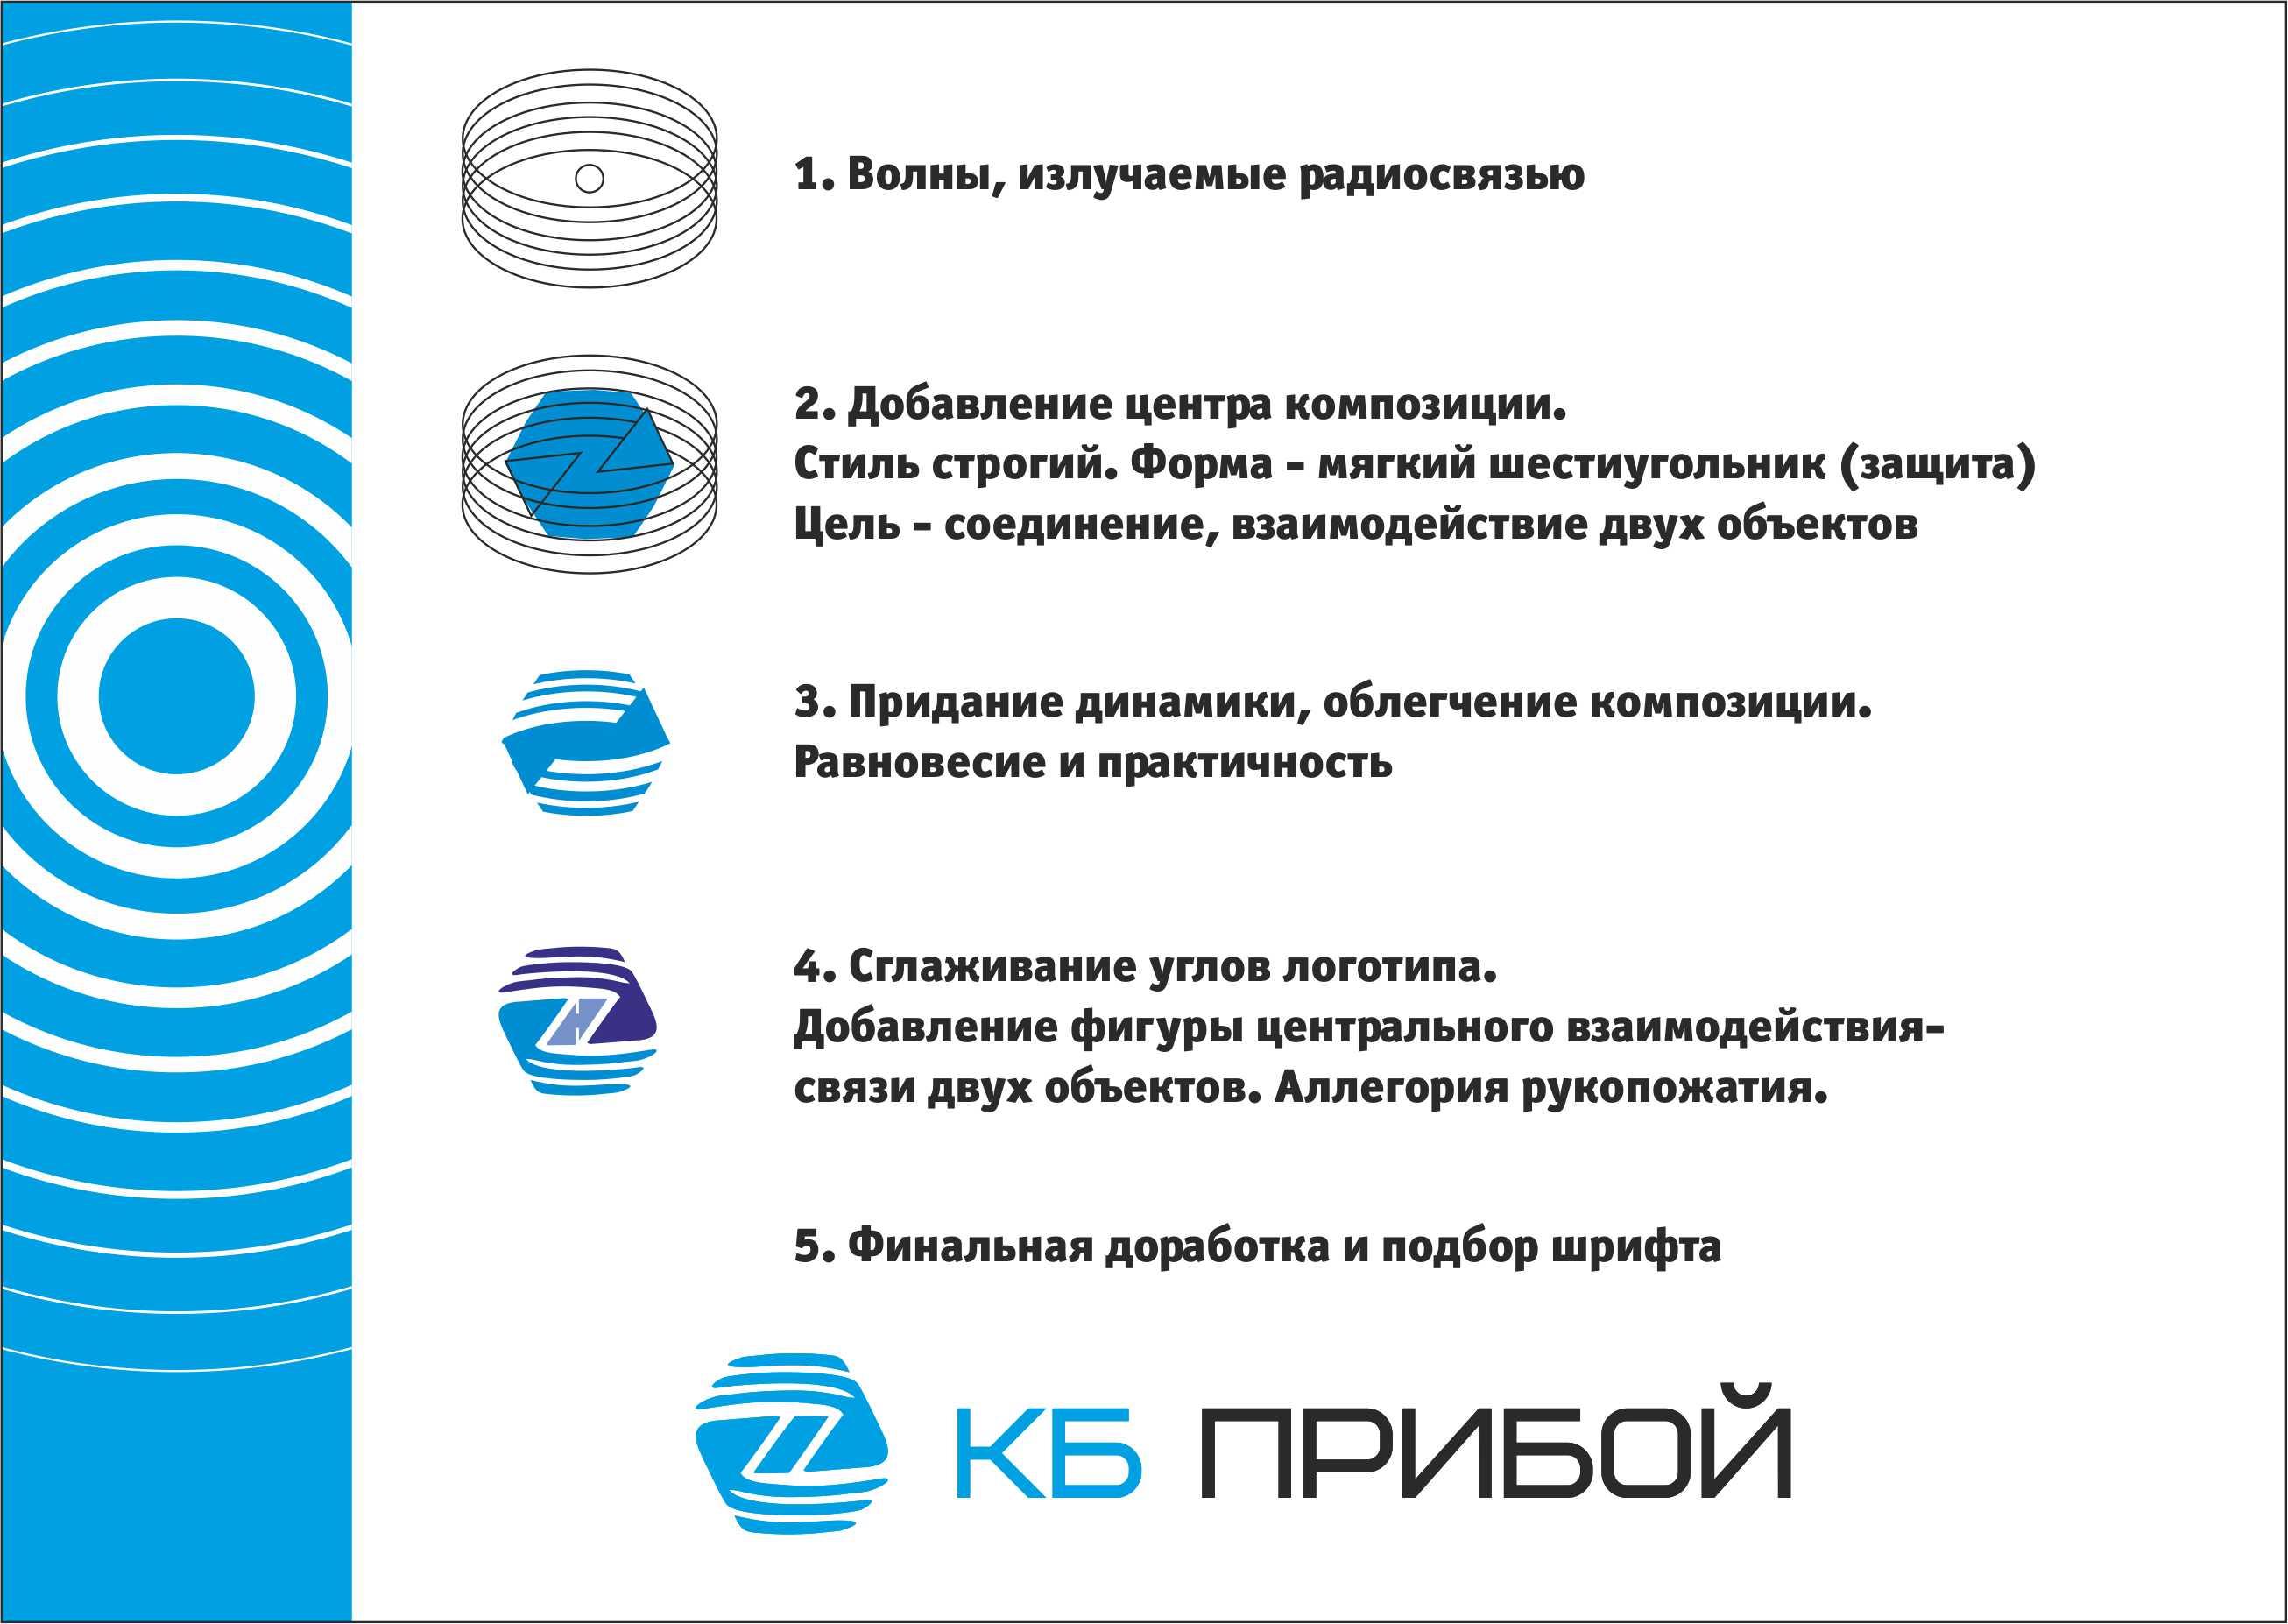 Разработка логотипа и фирменного стиля для КБ Прибой фото f_0435b240b6fad275.jpg